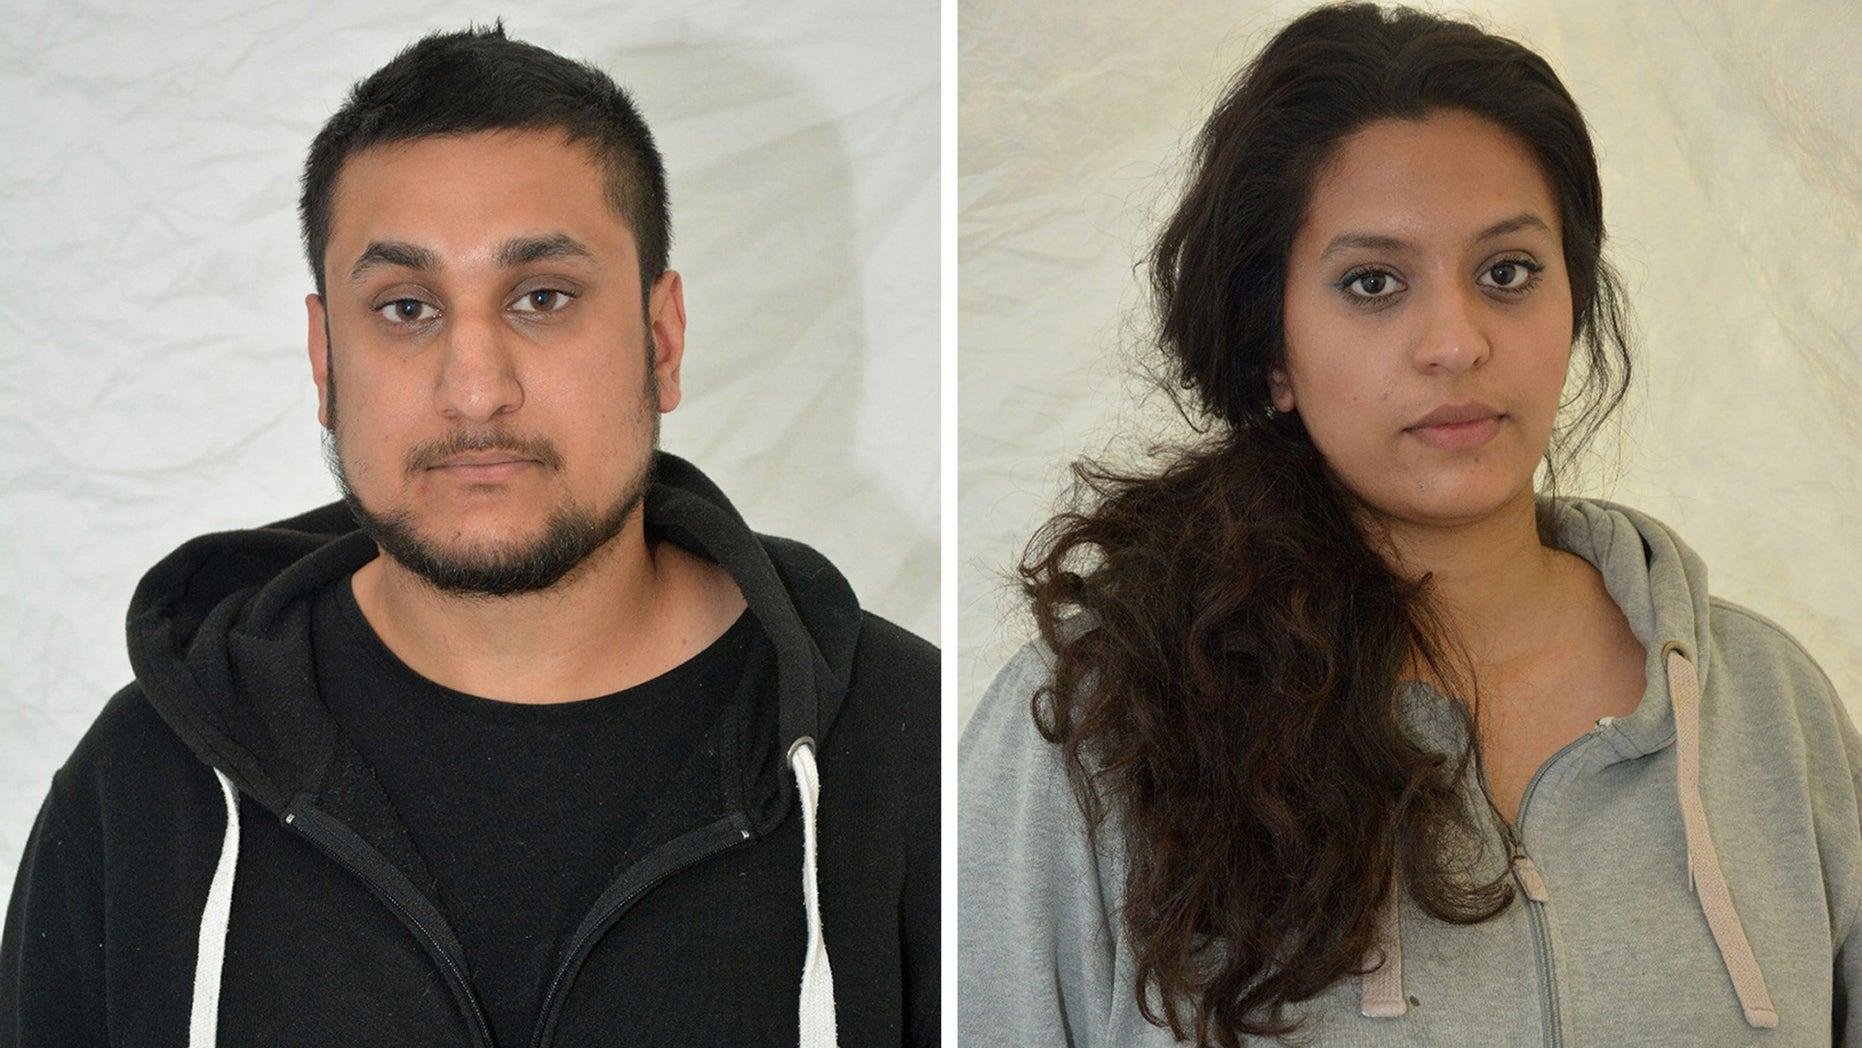 Mohammed Rehman and his wife, Sana Ahmed Khan.